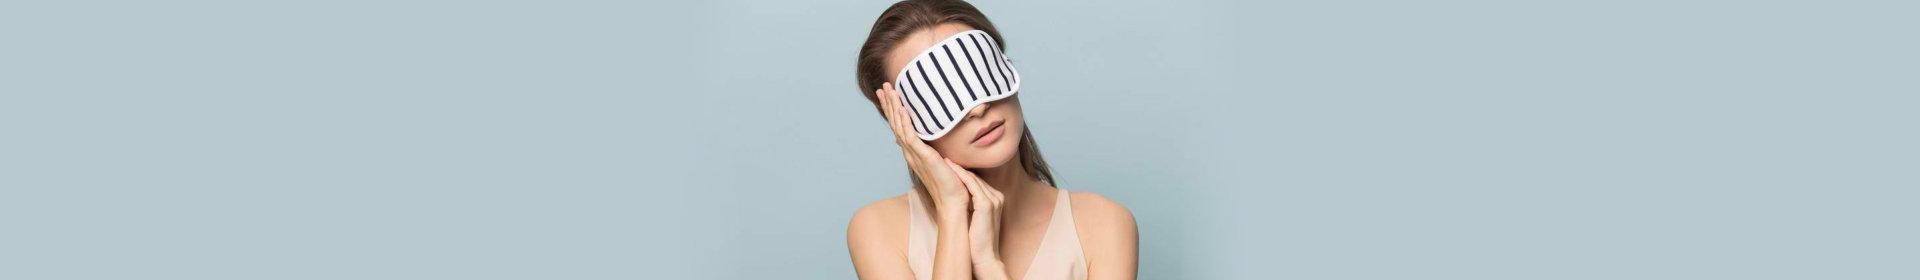 woman wearing sleeping mask